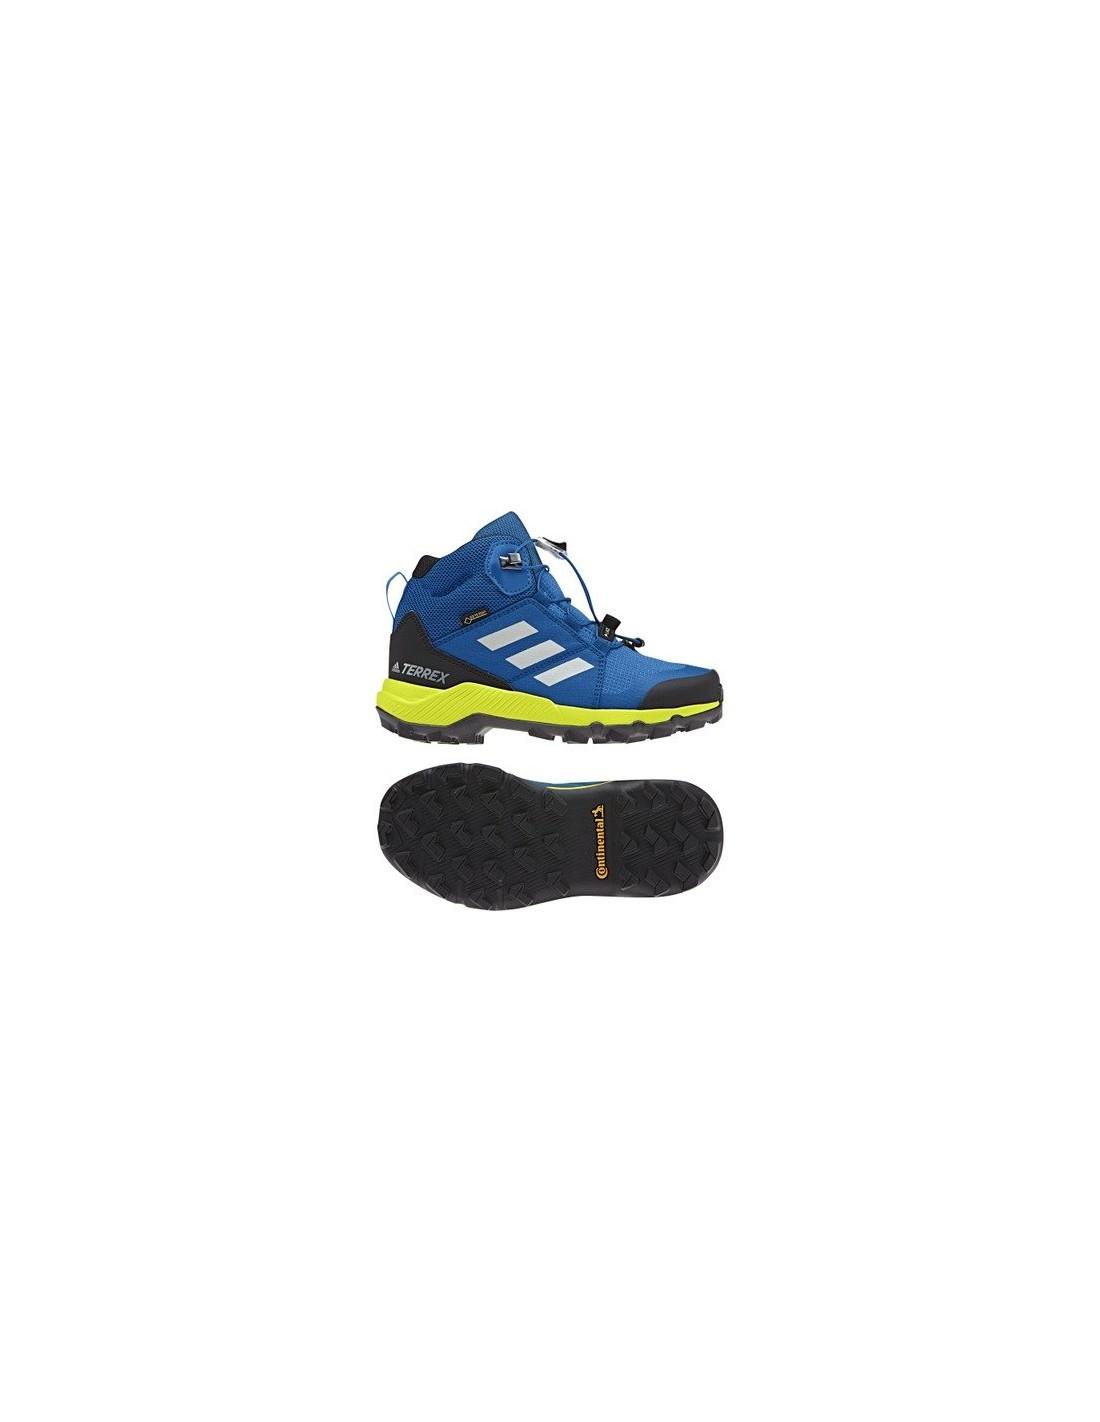 Hikingsko Barn&Junior Adidas Terrex Mid GTS Junior Blue BC0596 1,099.00